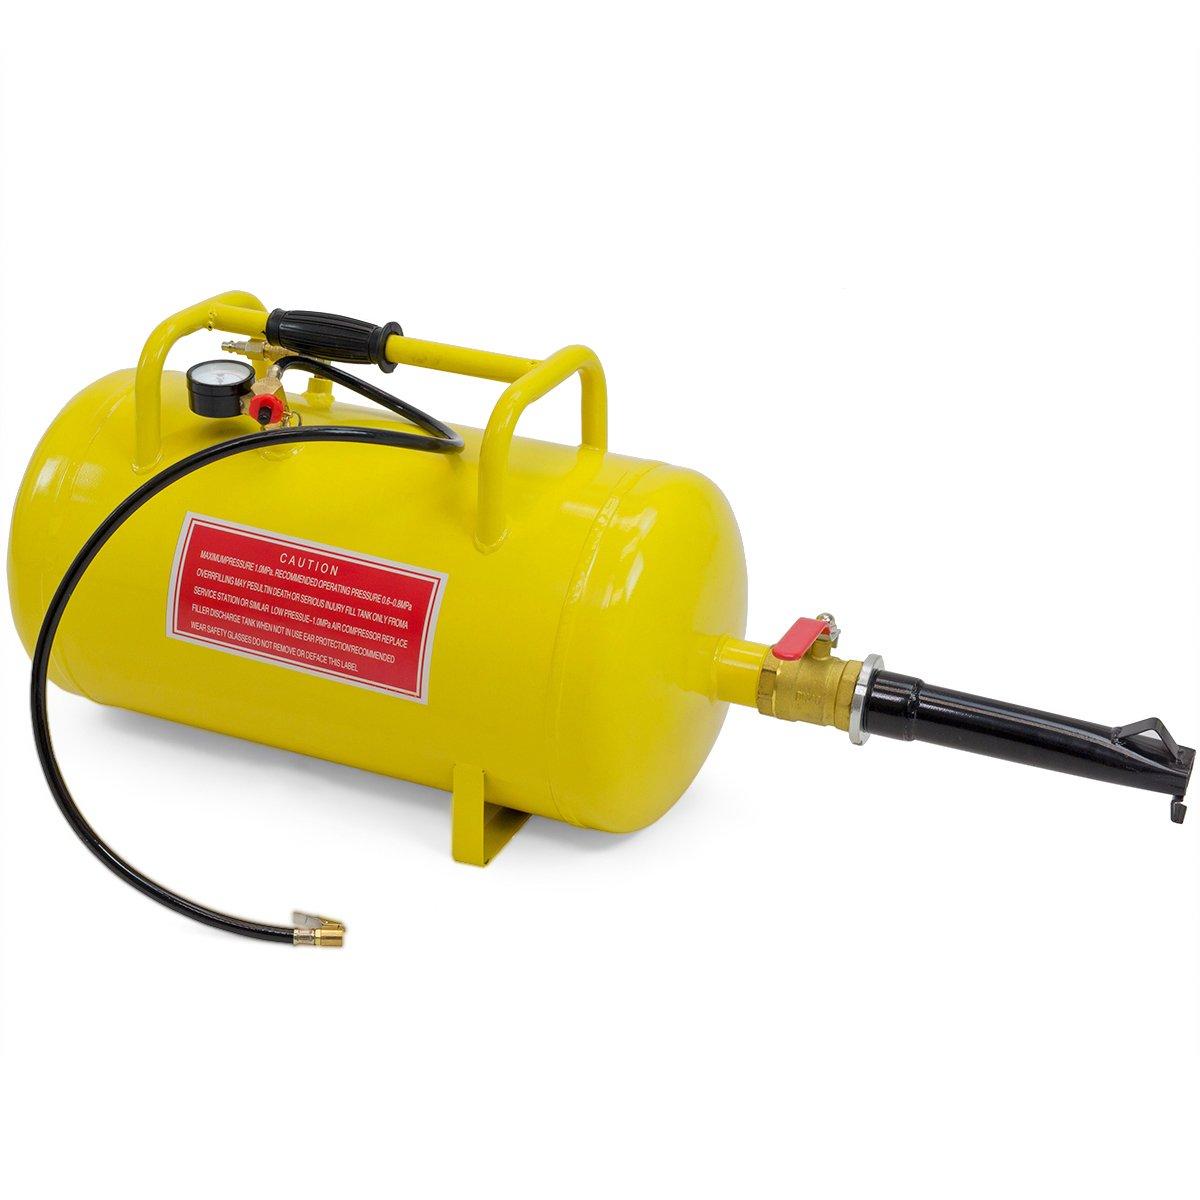 Air Tank combo Tire inflator Rim Bead seater Breaker Breaking Blaster, 10-Gallon